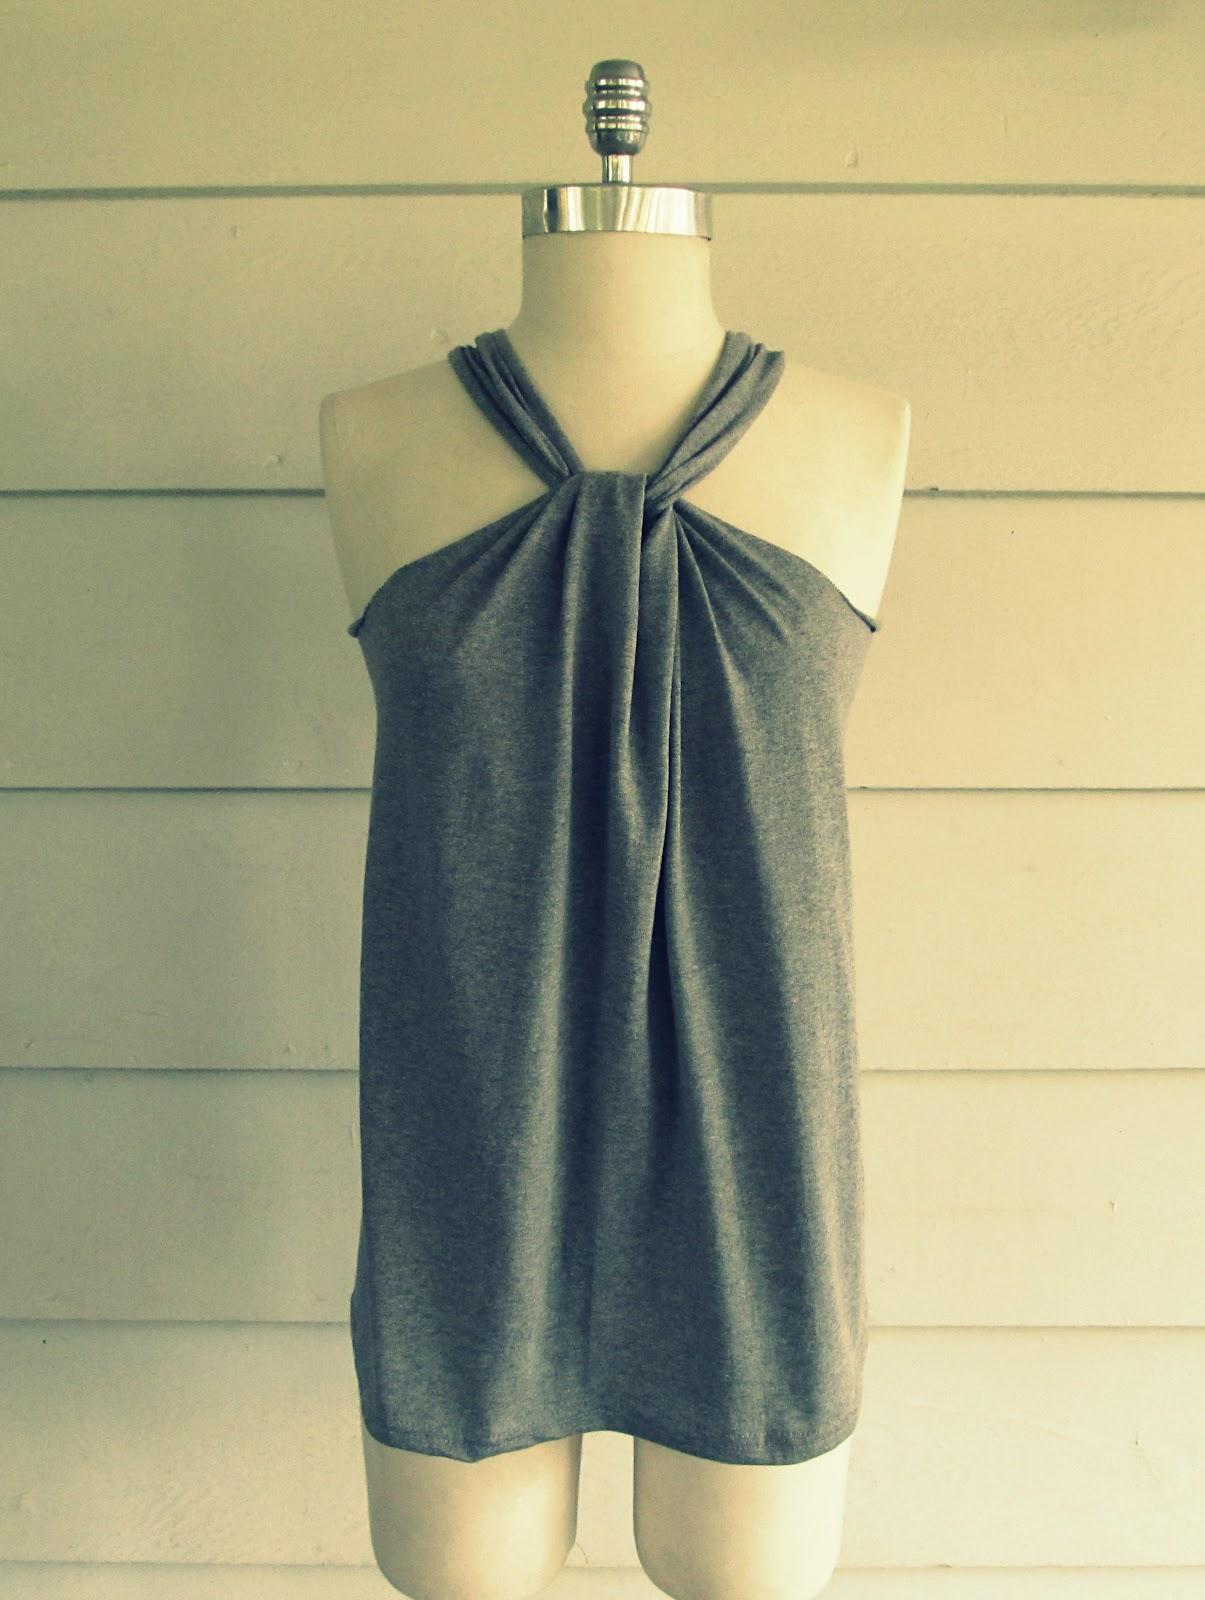 wobisobi no sew tee shirt halter 3 diy. Black Bedroom Furniture Sets. Home Design Ideas